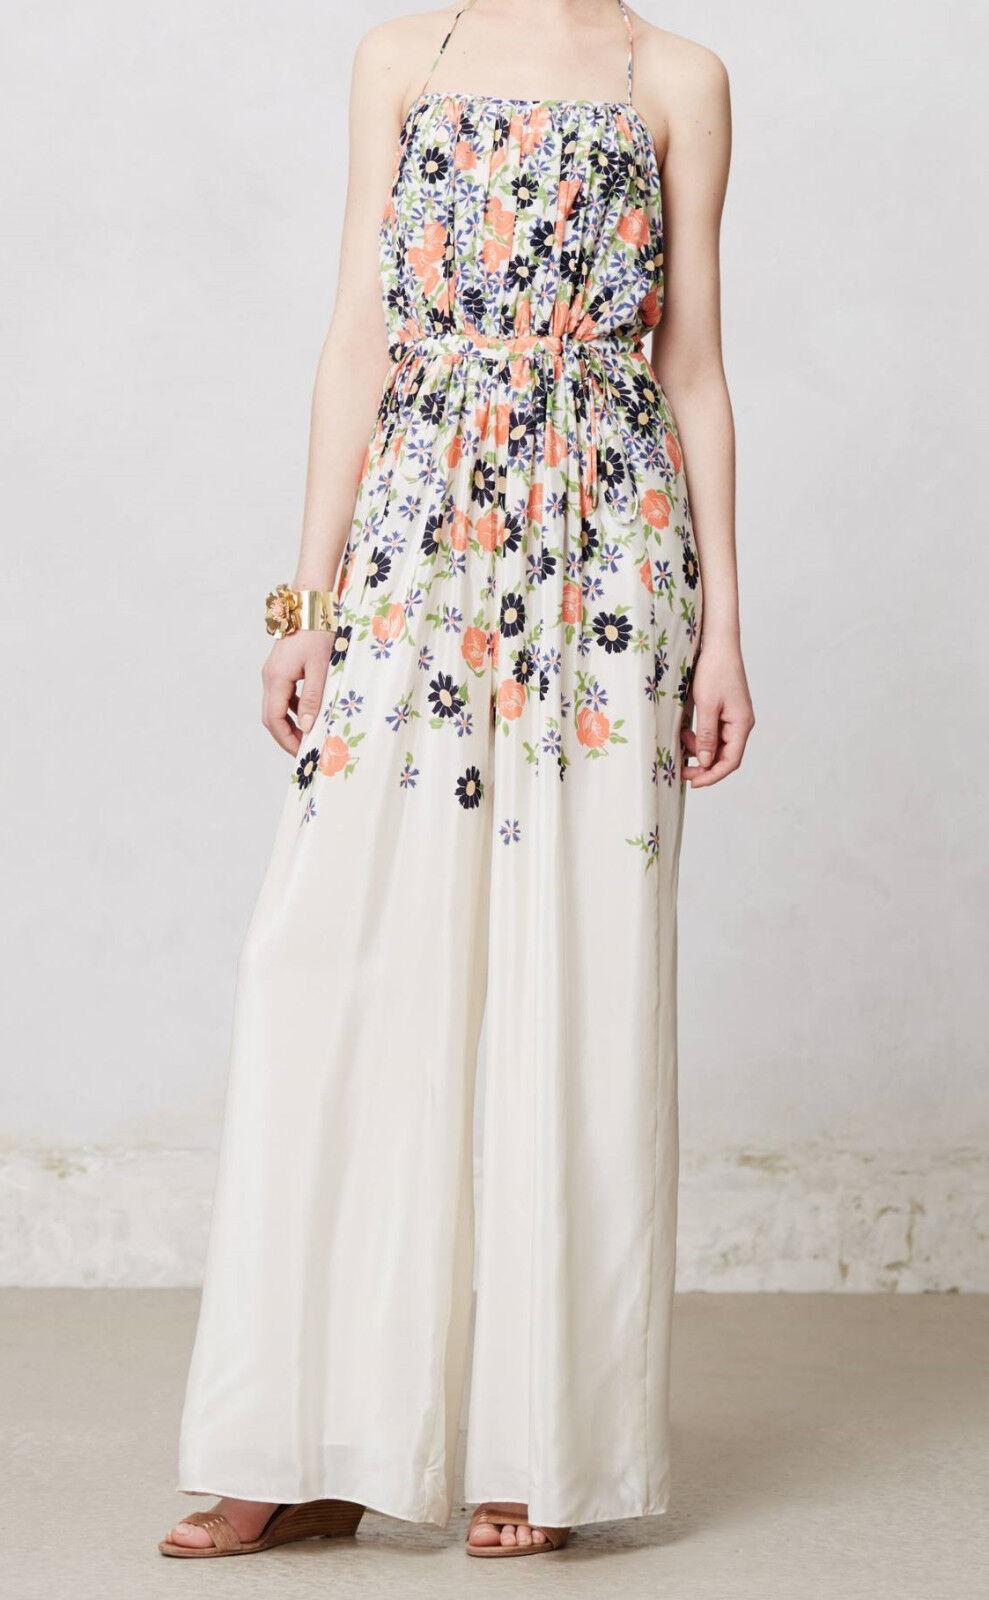 Elevenses Silk Tupsa Pleated Jumpsuit Sizes 10, 14 Multi NW ANTHROPOLOGIE Tag